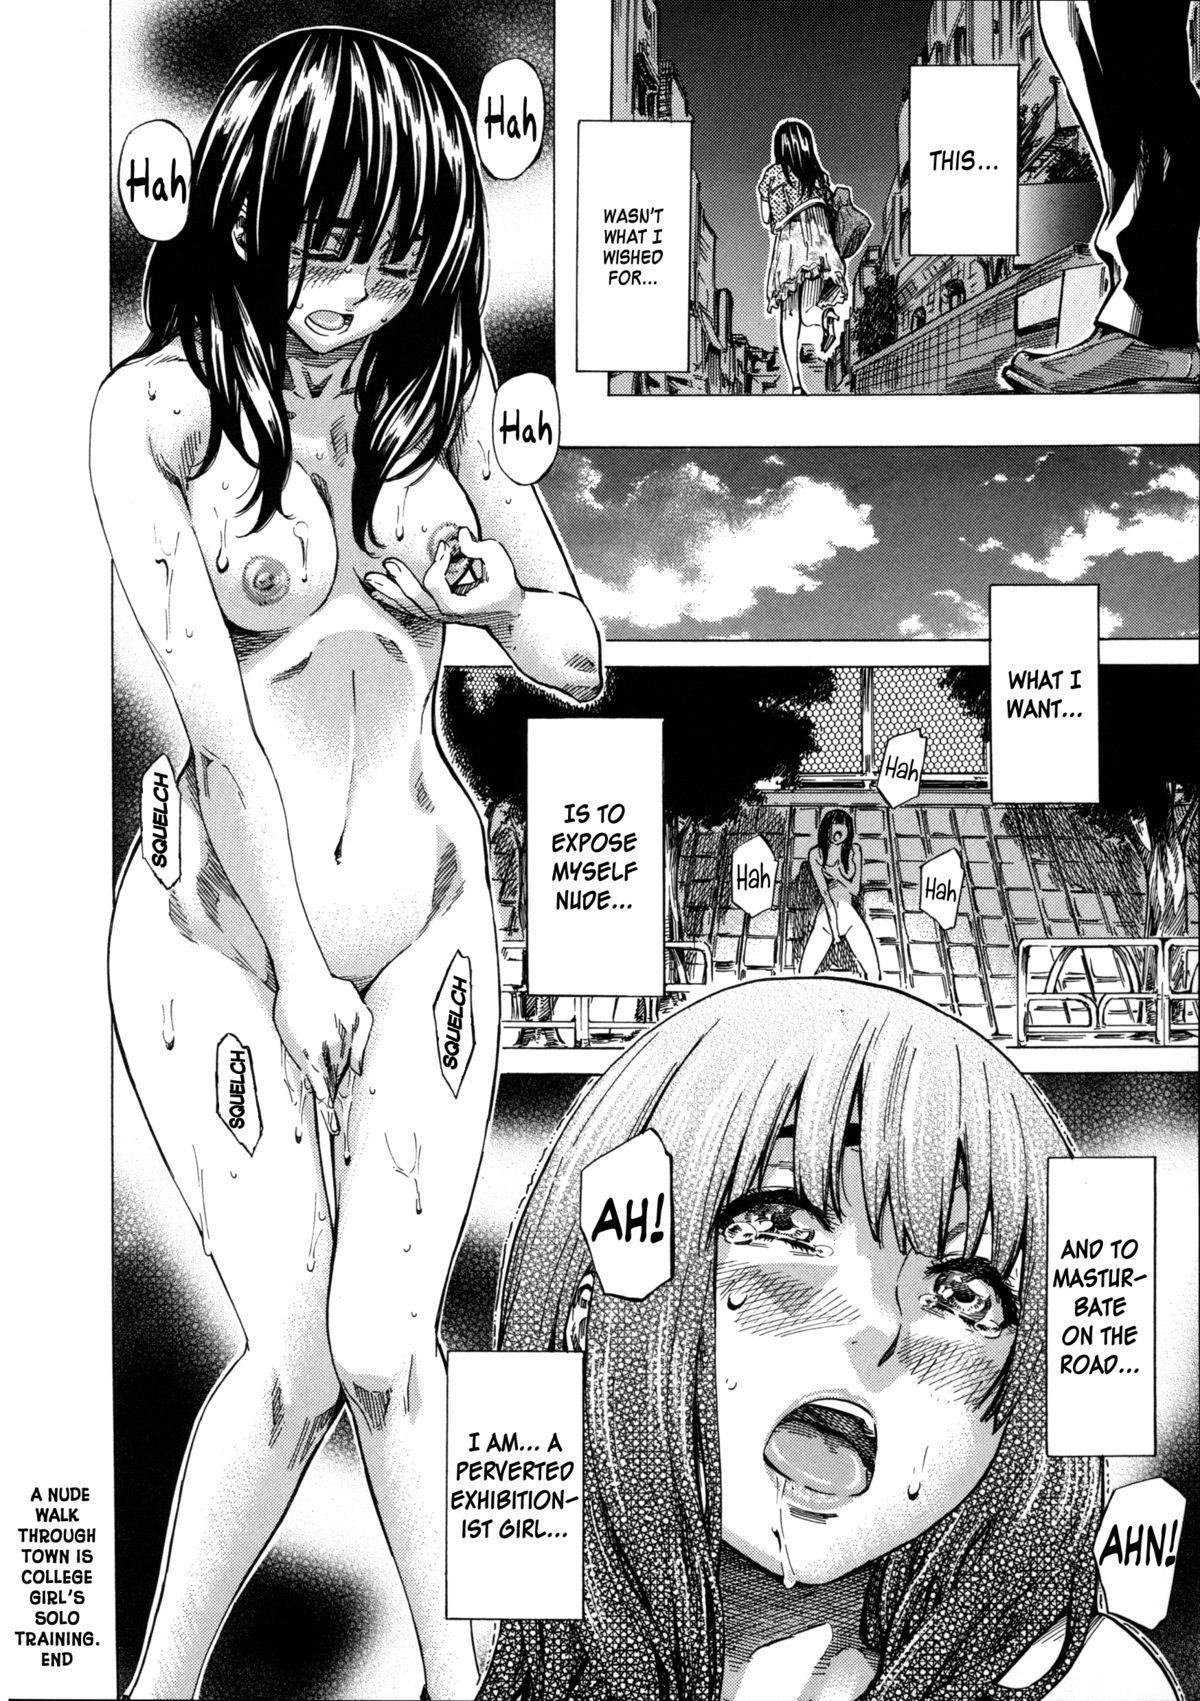 Kashiwazaki Miki wa Ironna Basho de Zenra Sanpo Shitemita   Miki Kashiwazaki Goes Naked in All Sorts of Places Ch. 1-4 88